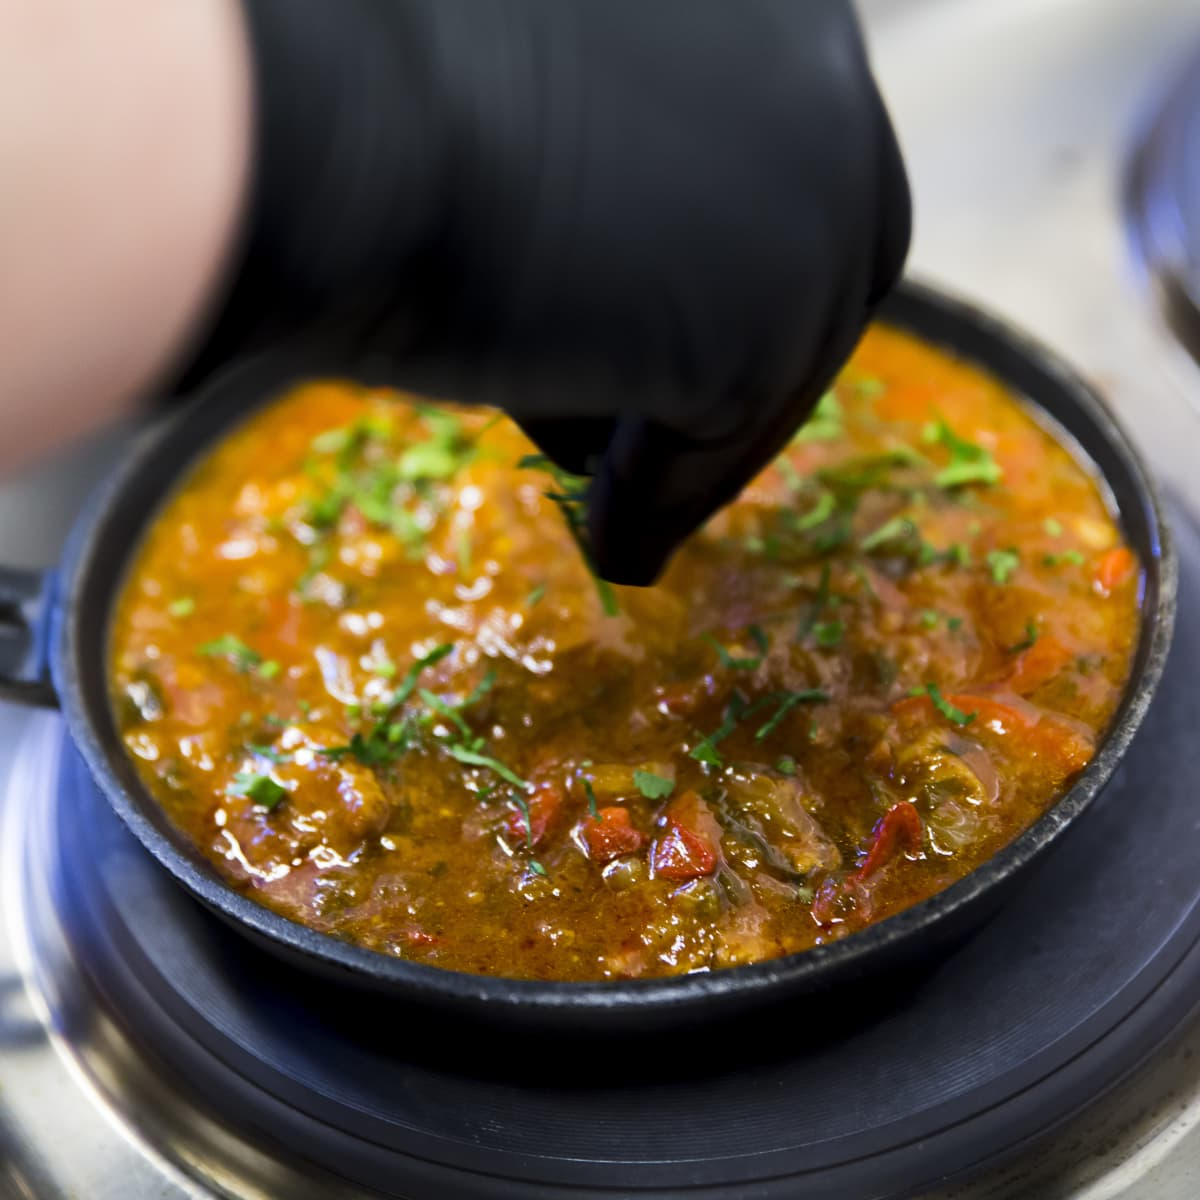 Gerogialainen ruoka-annos chashushuli ravintola Rionissa